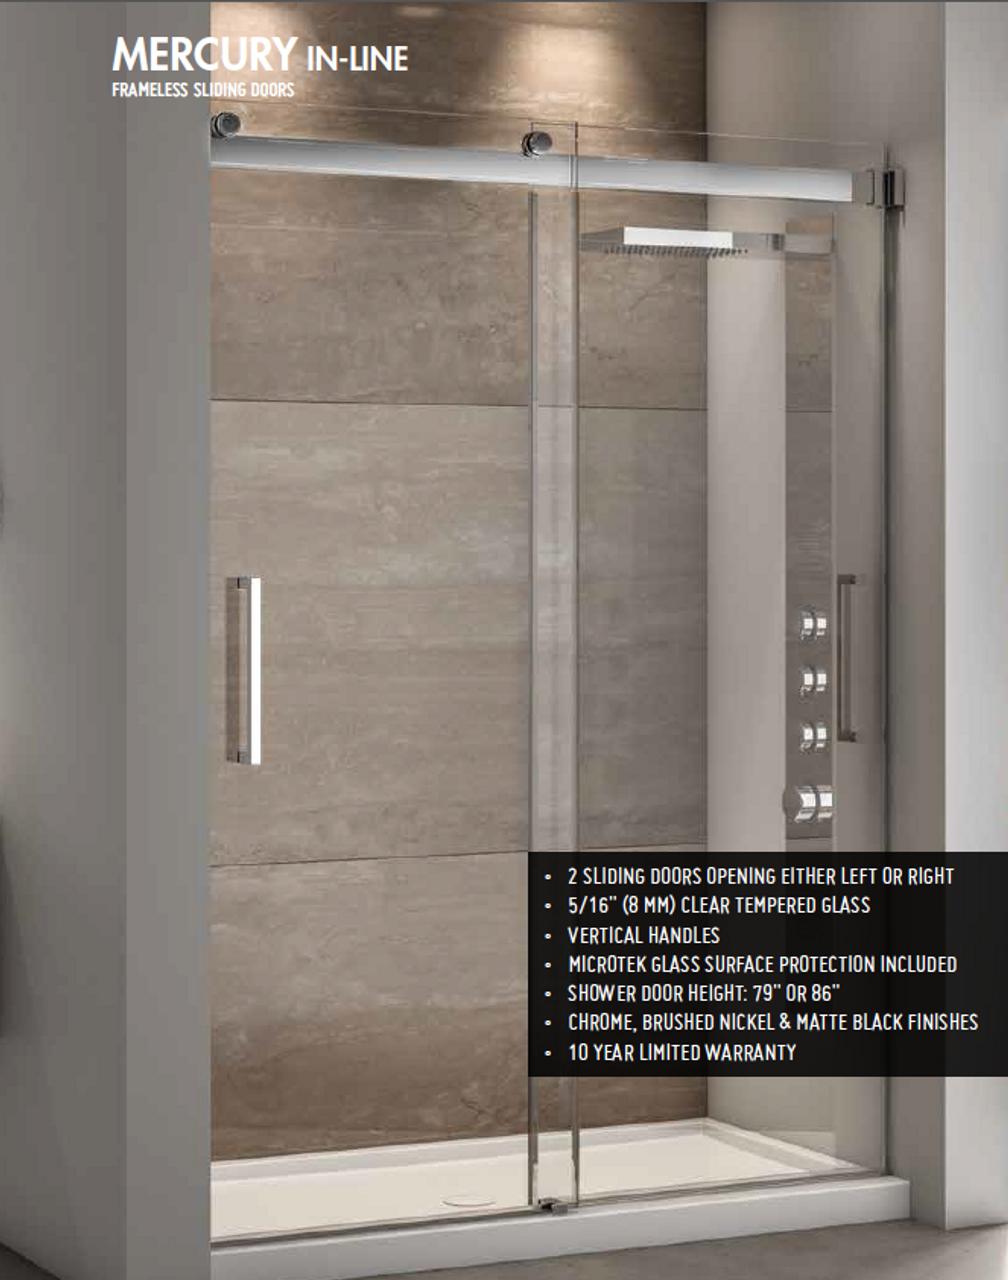 Fleurco Mercury In Line Frameless Sliding Doors Bypass 48 Chrome American Bath